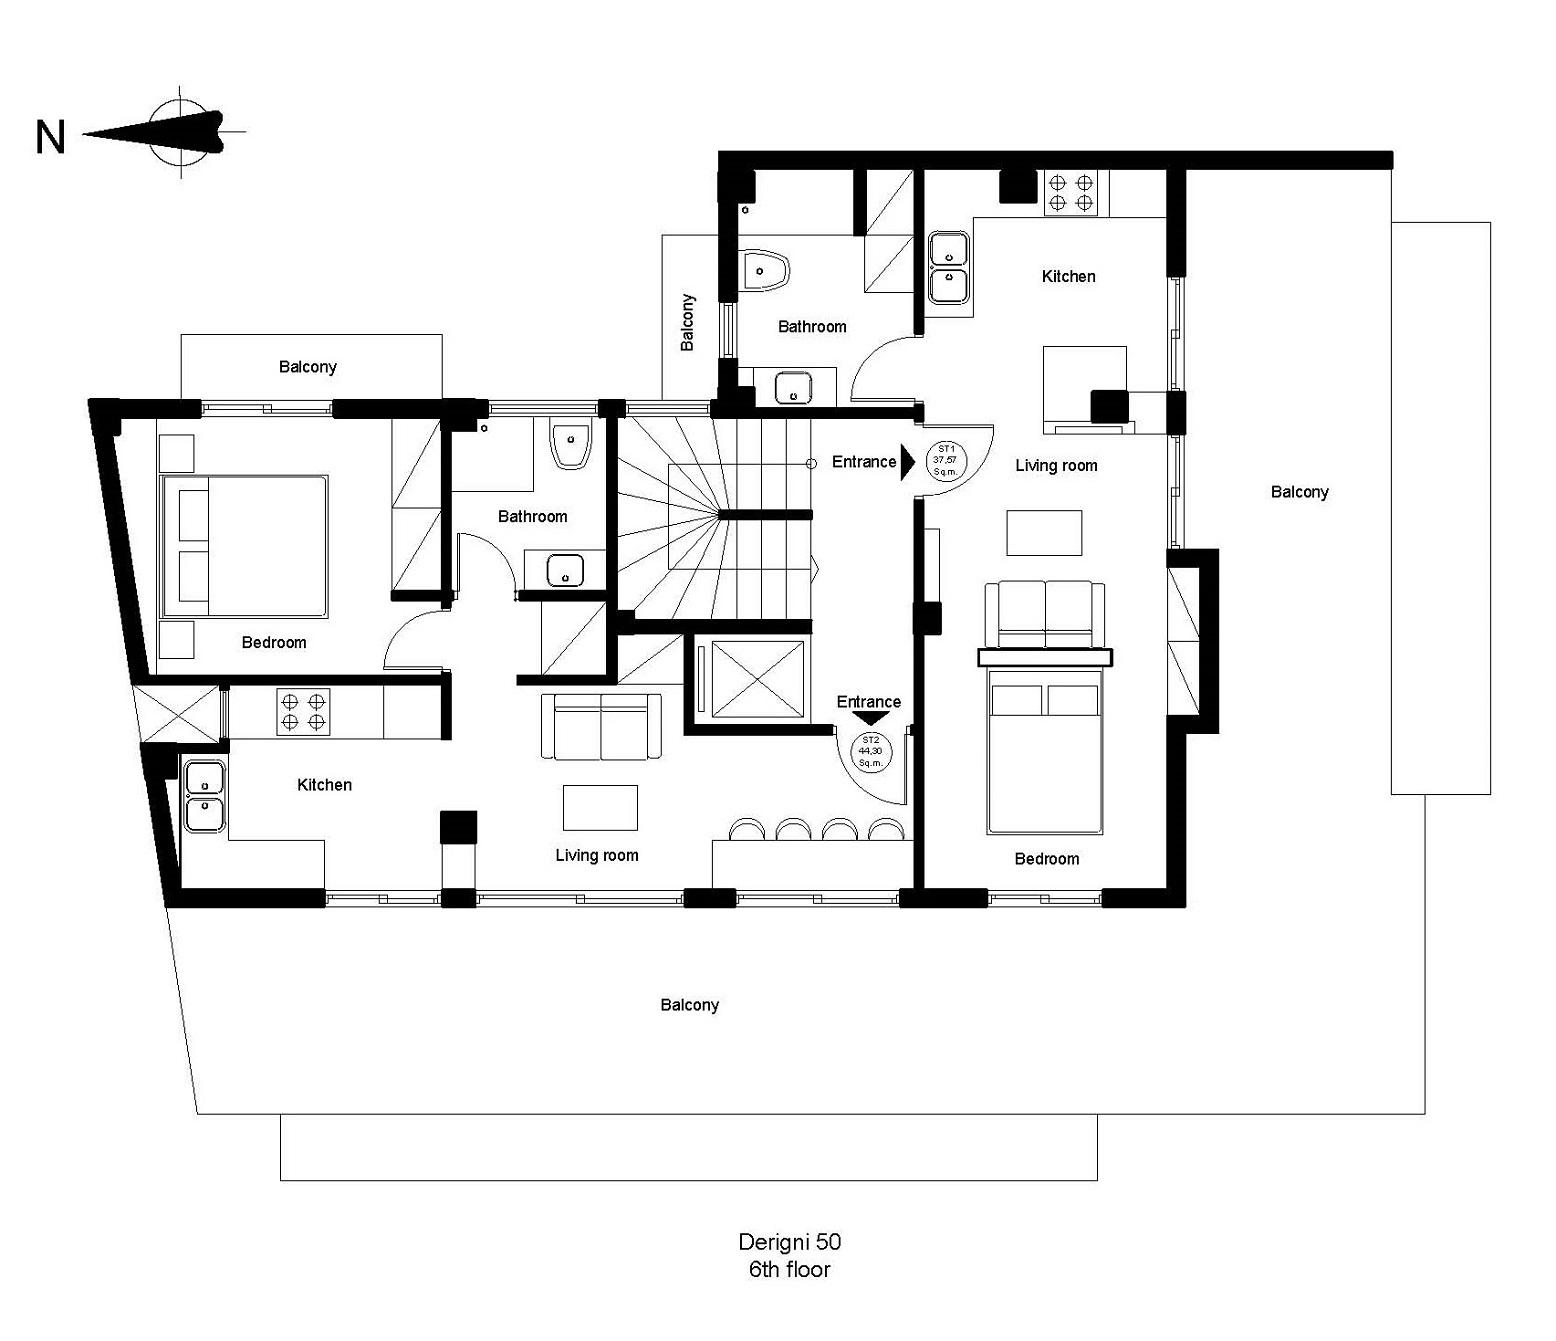 Derigni 50 6th floor plan